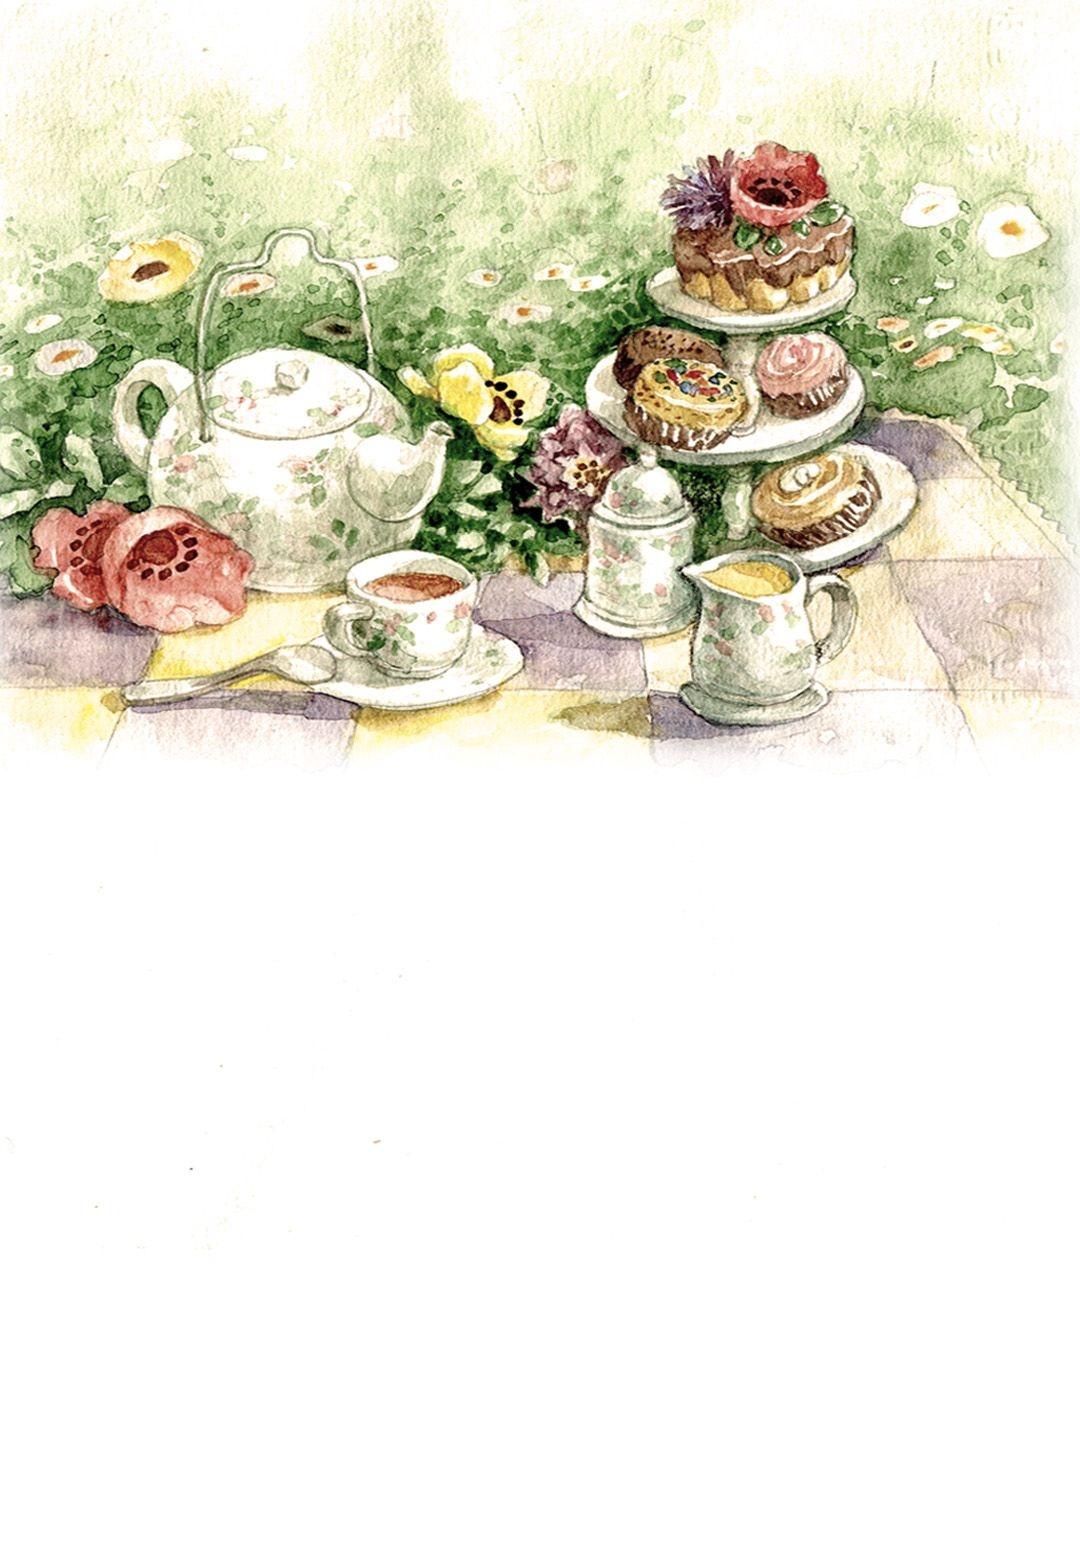 Free Printable Tea Party Invitation | Tea Party Ideas In 2019 - Free Printable Vintage Tea Party Invitations